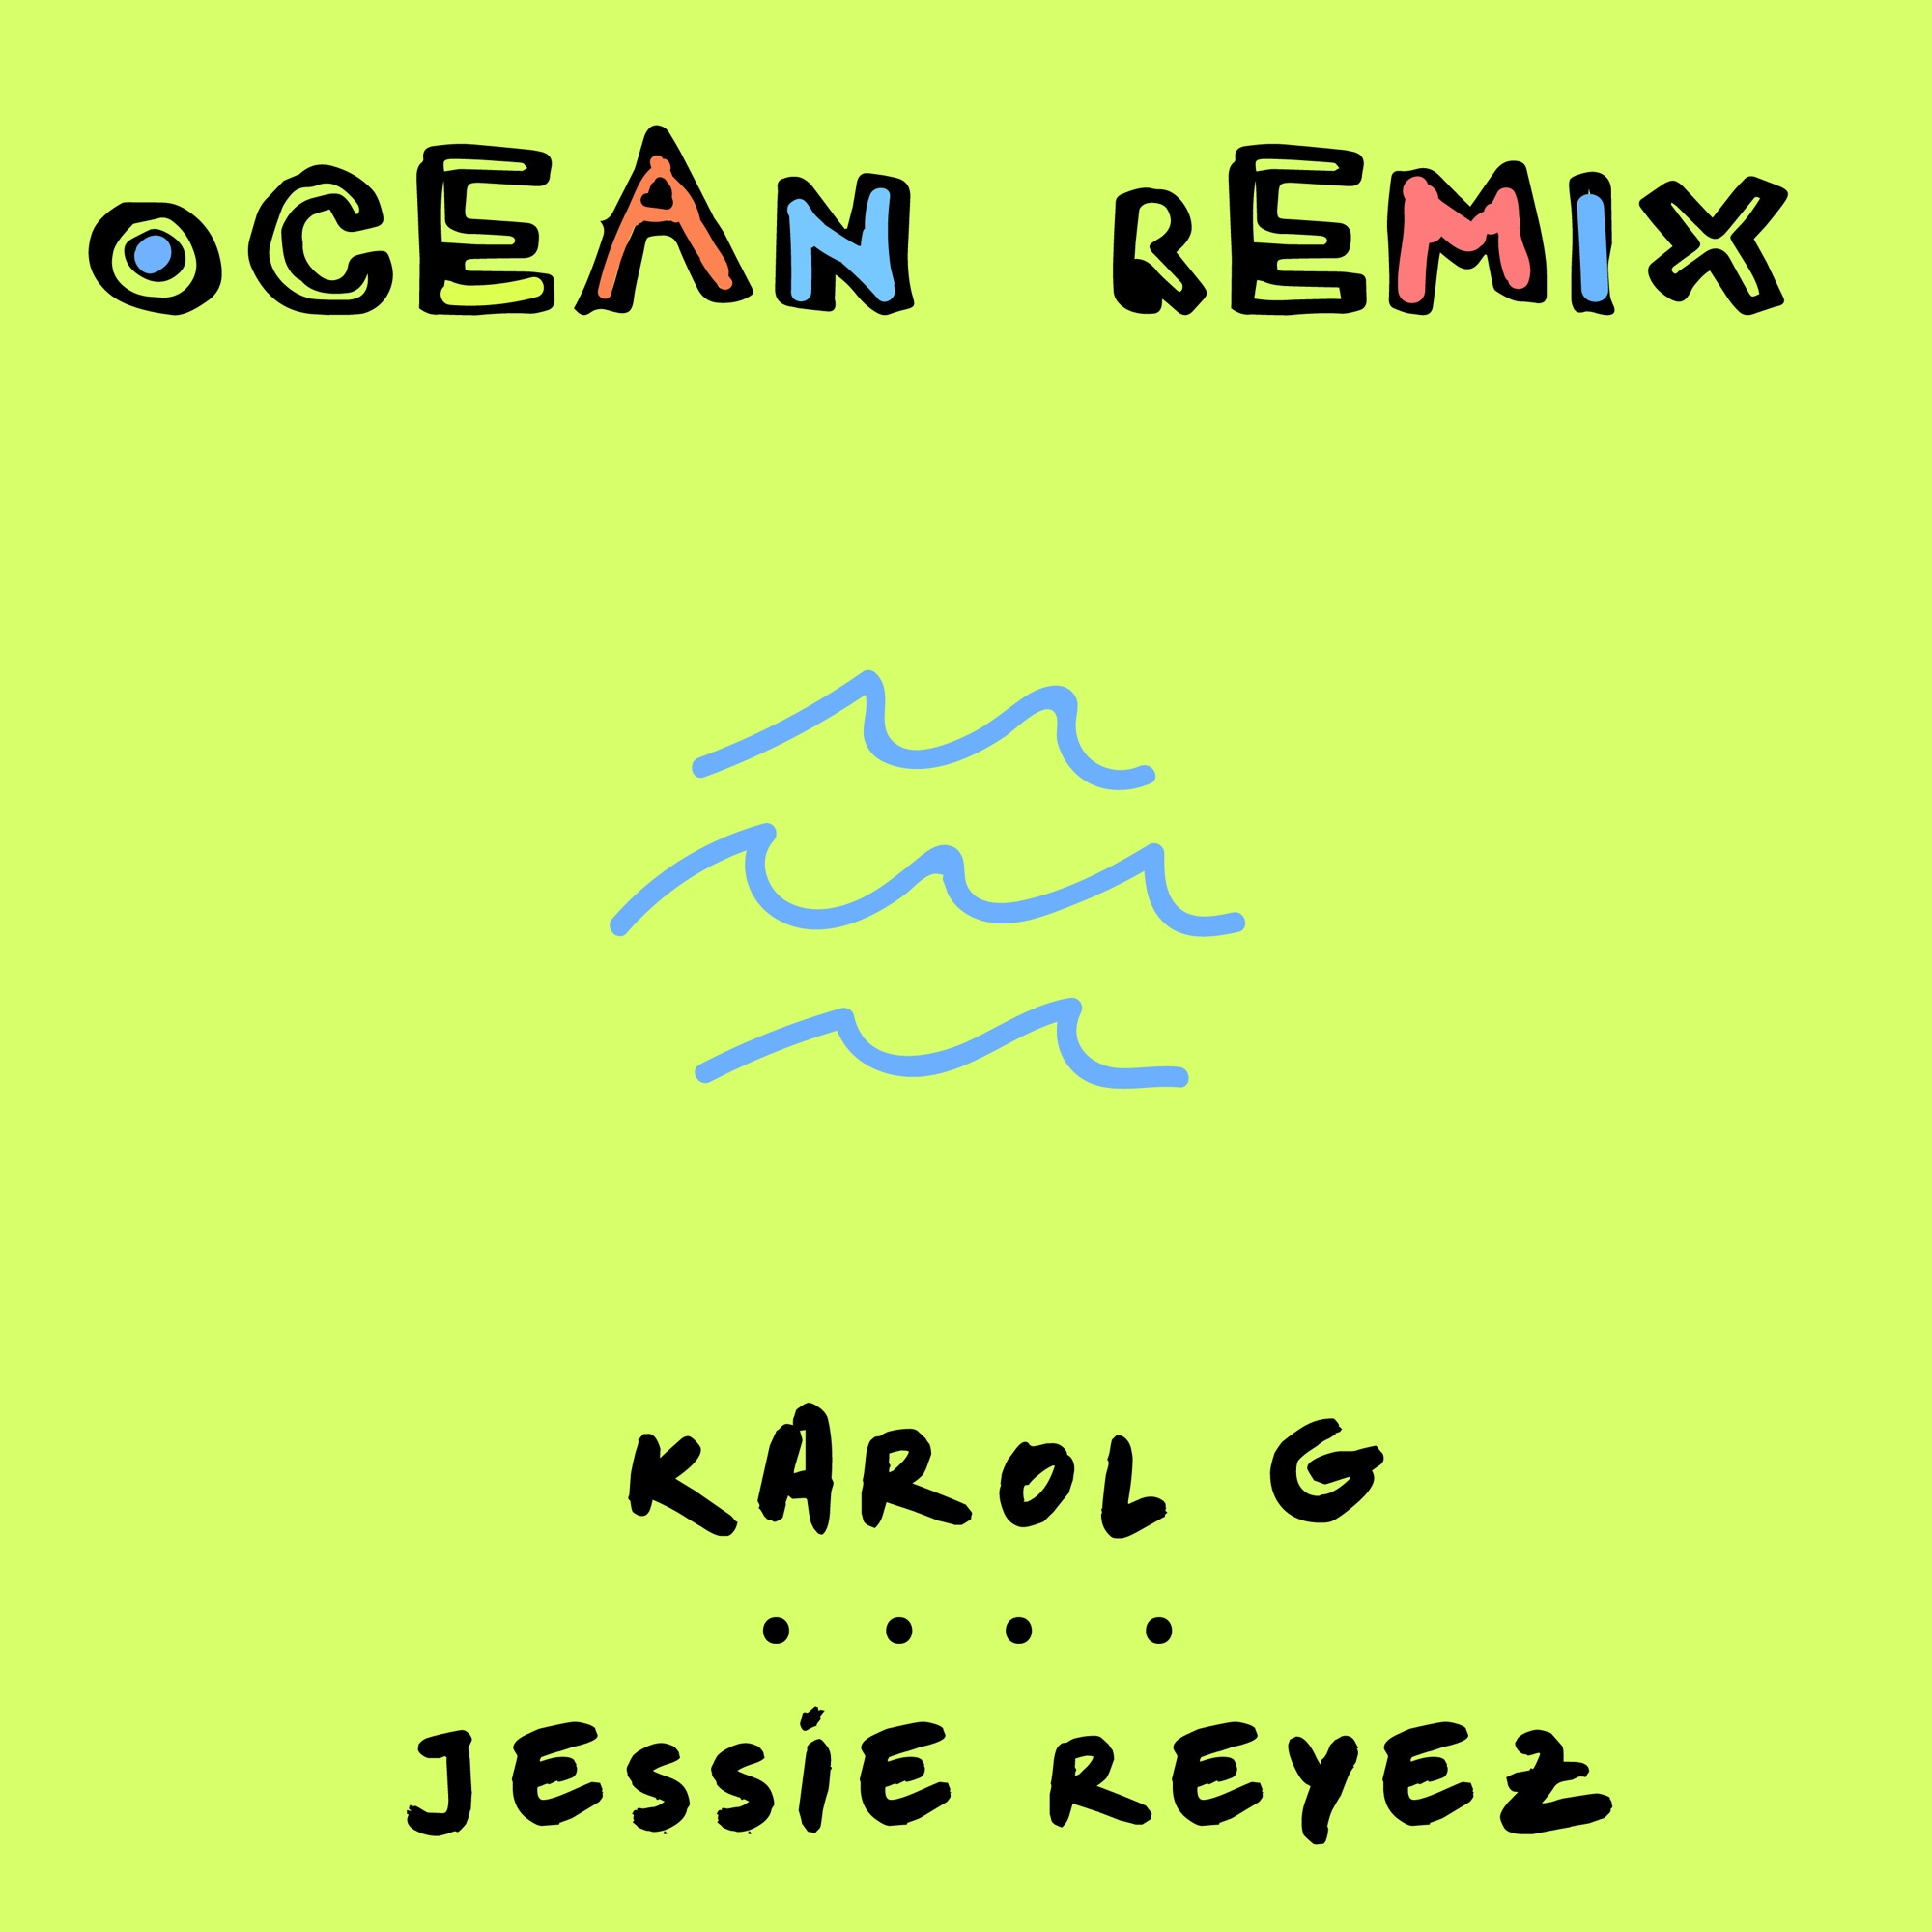 Karol G Ft. Jessie Reyez - Ocean (Remix)